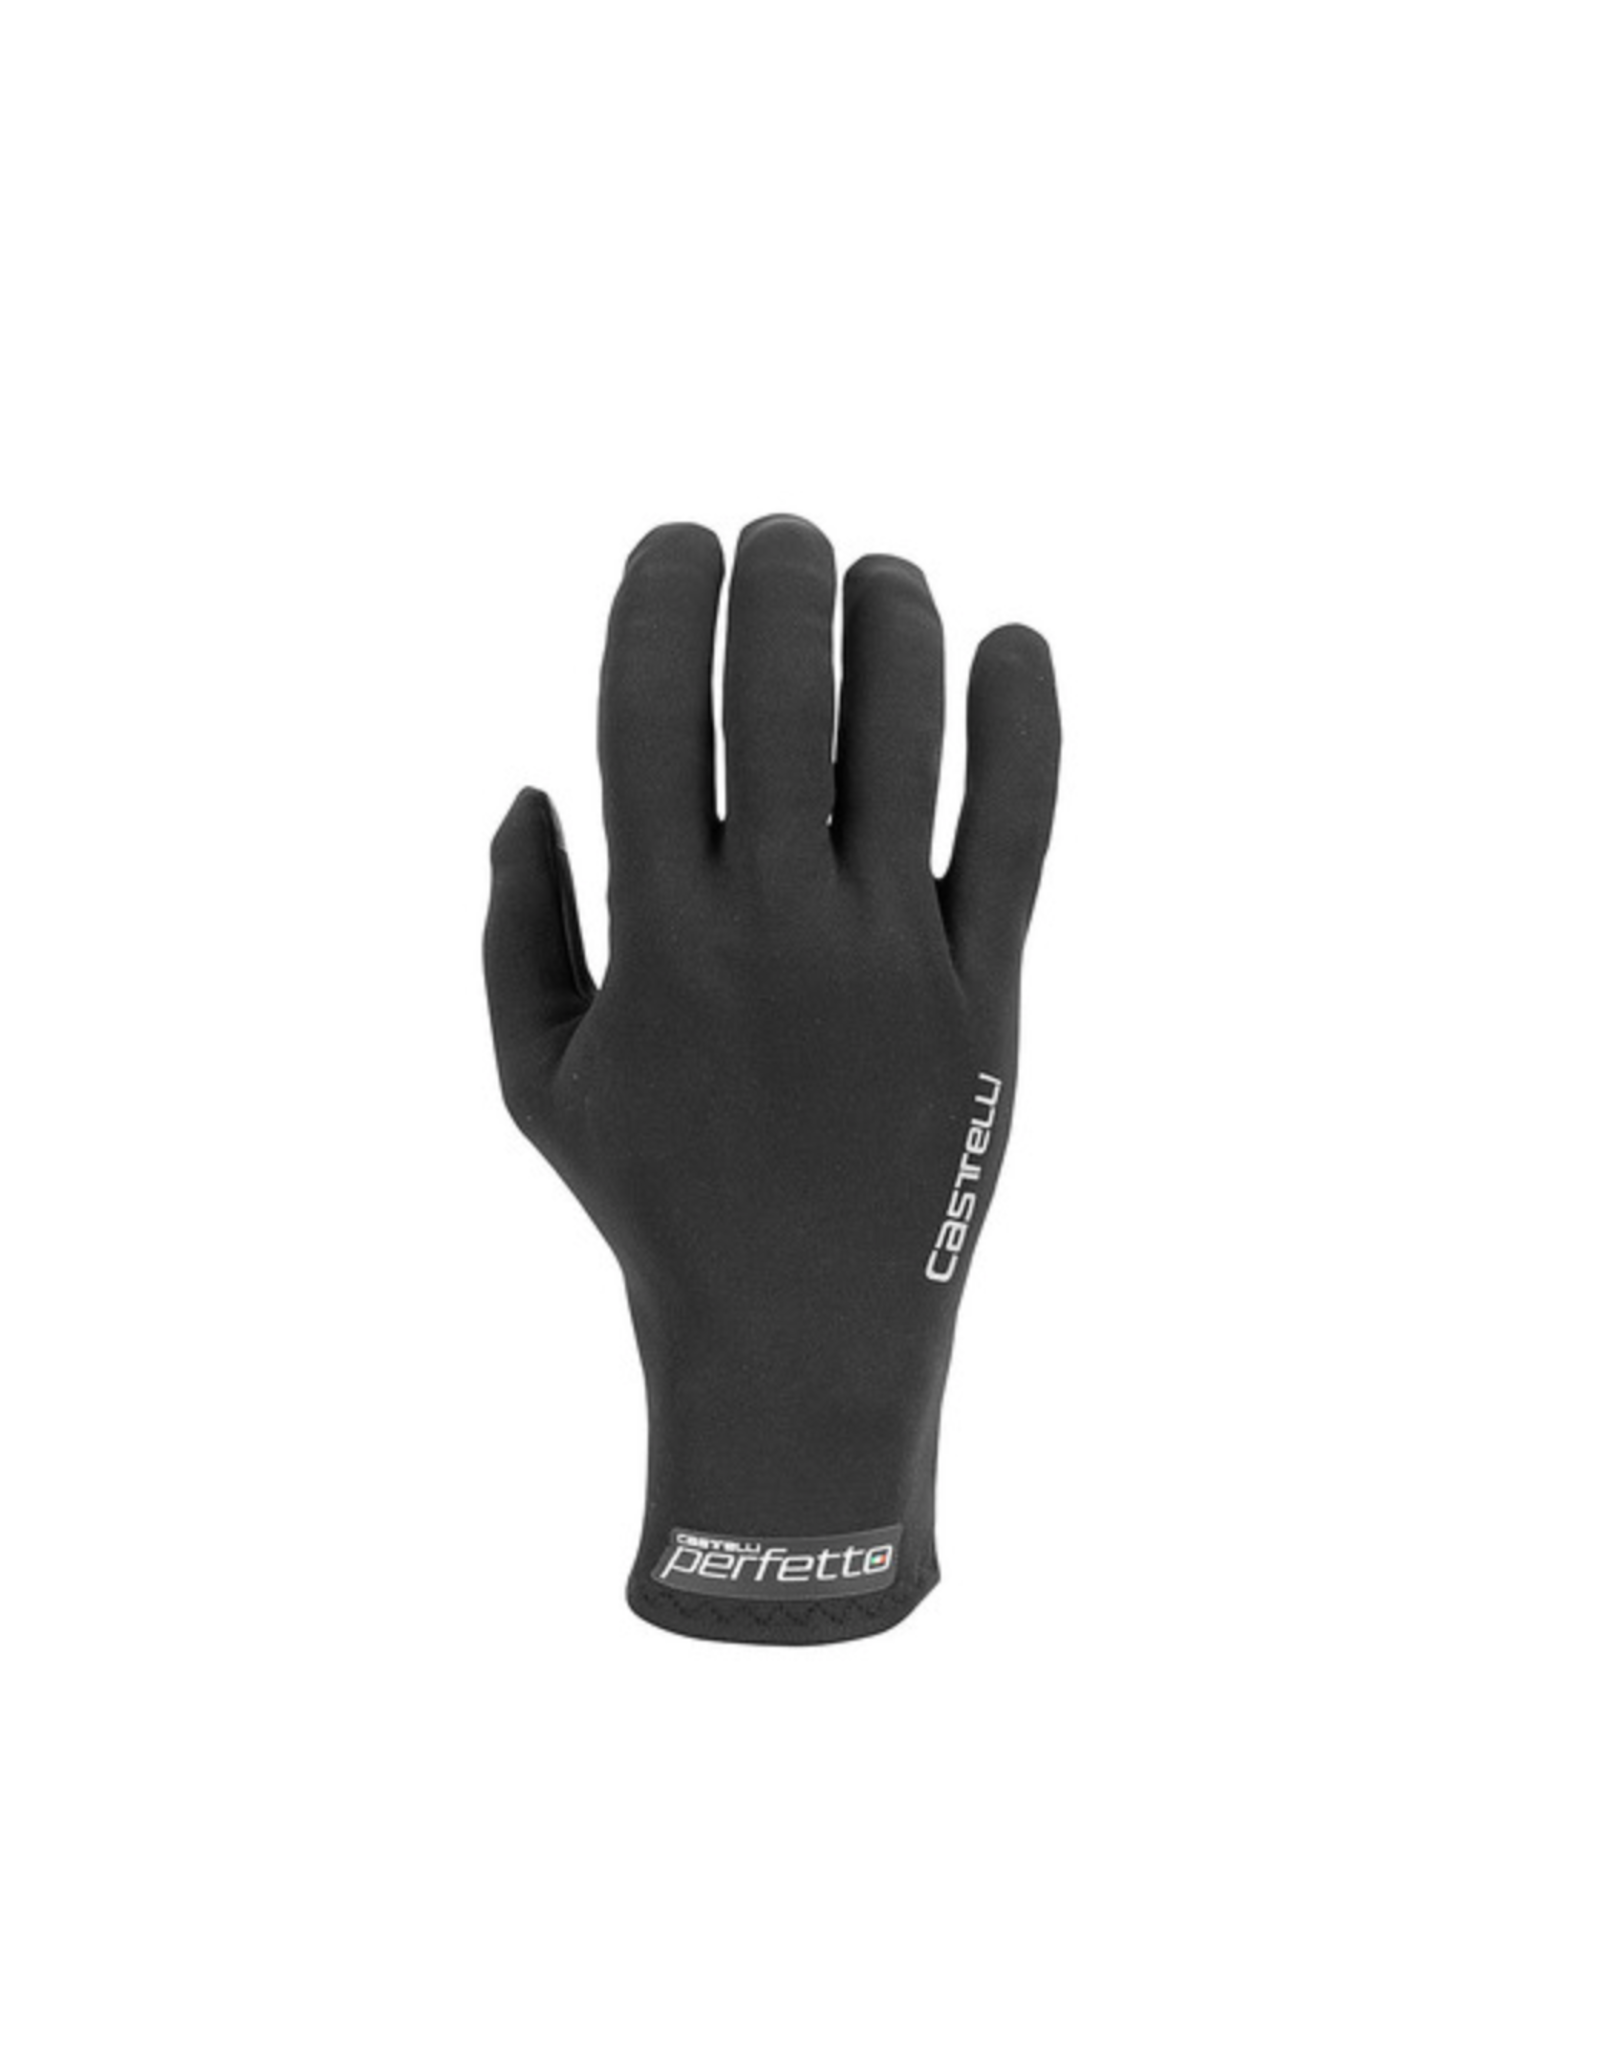 Castelli '20, CASTELLI, Womens Glove, Perfetto ROS